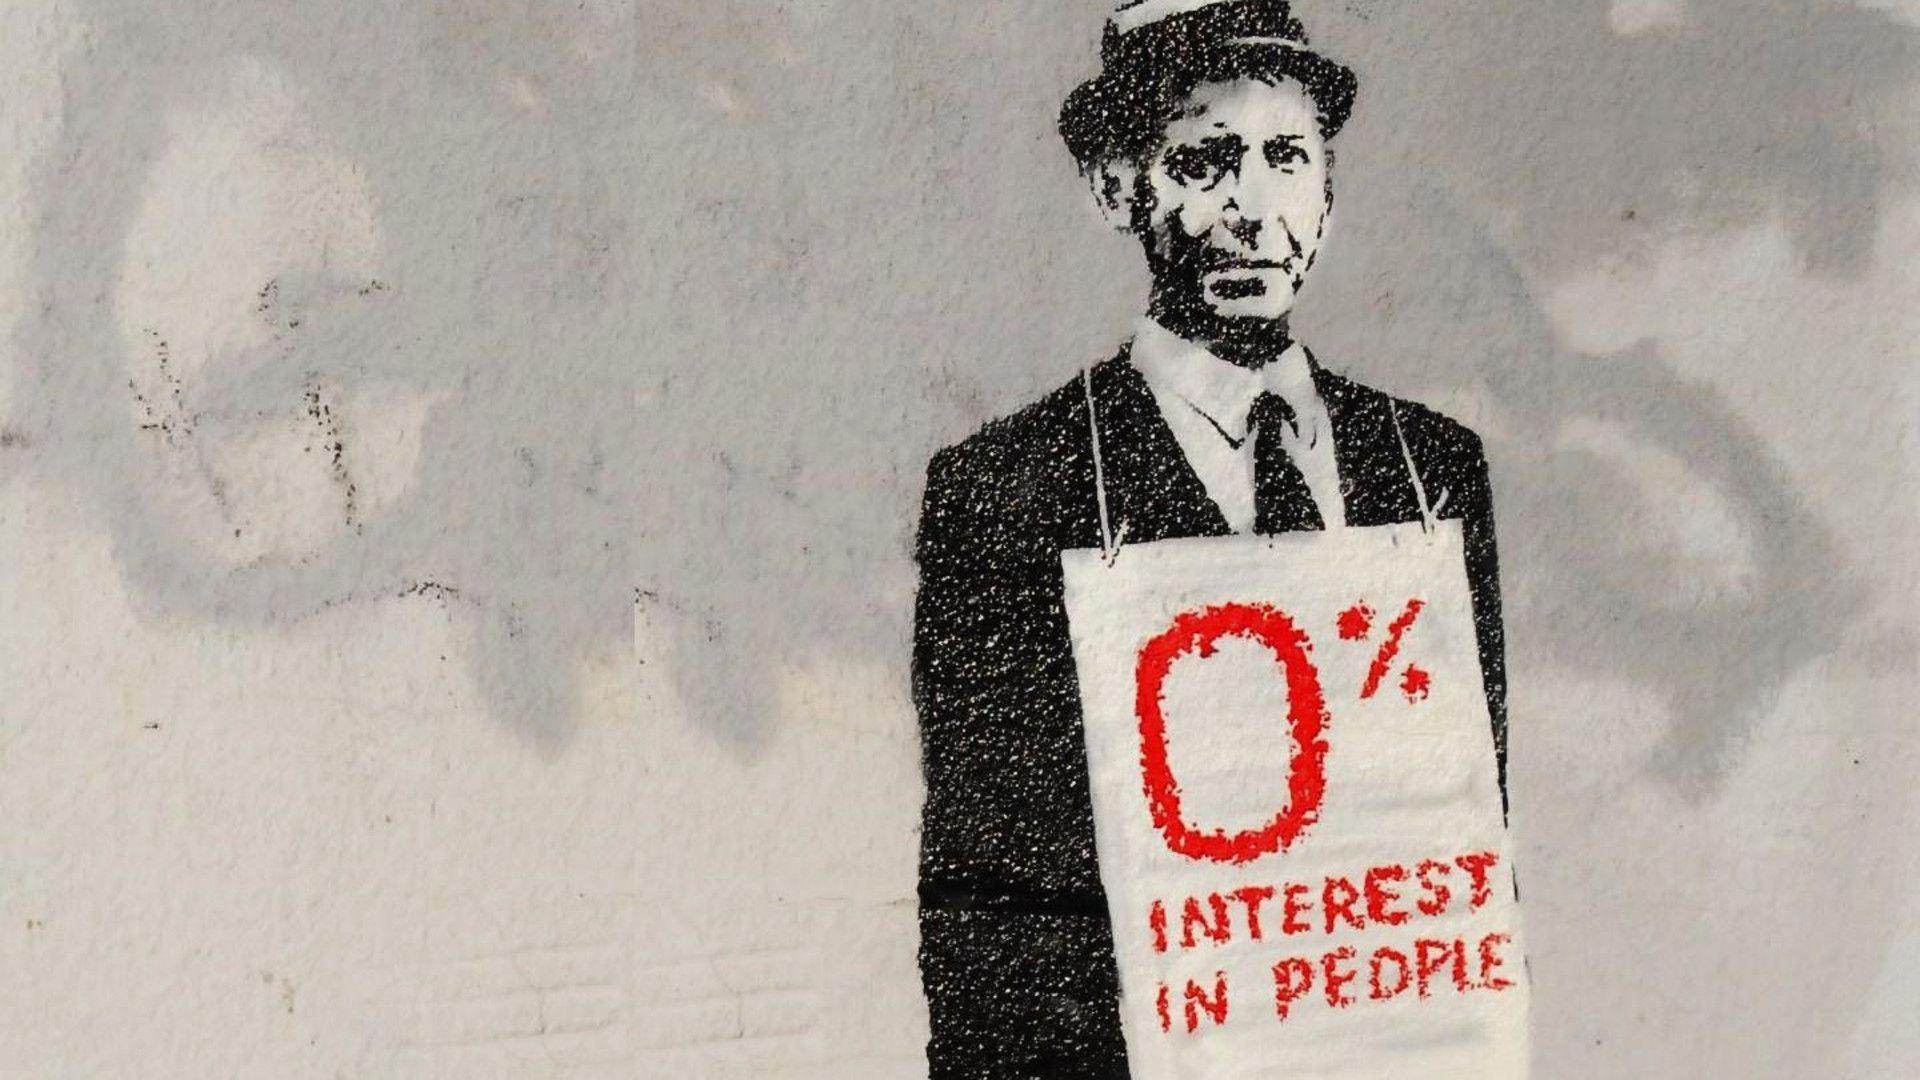 Free Download Hd Banksy Art Wallpaper Street Of Part